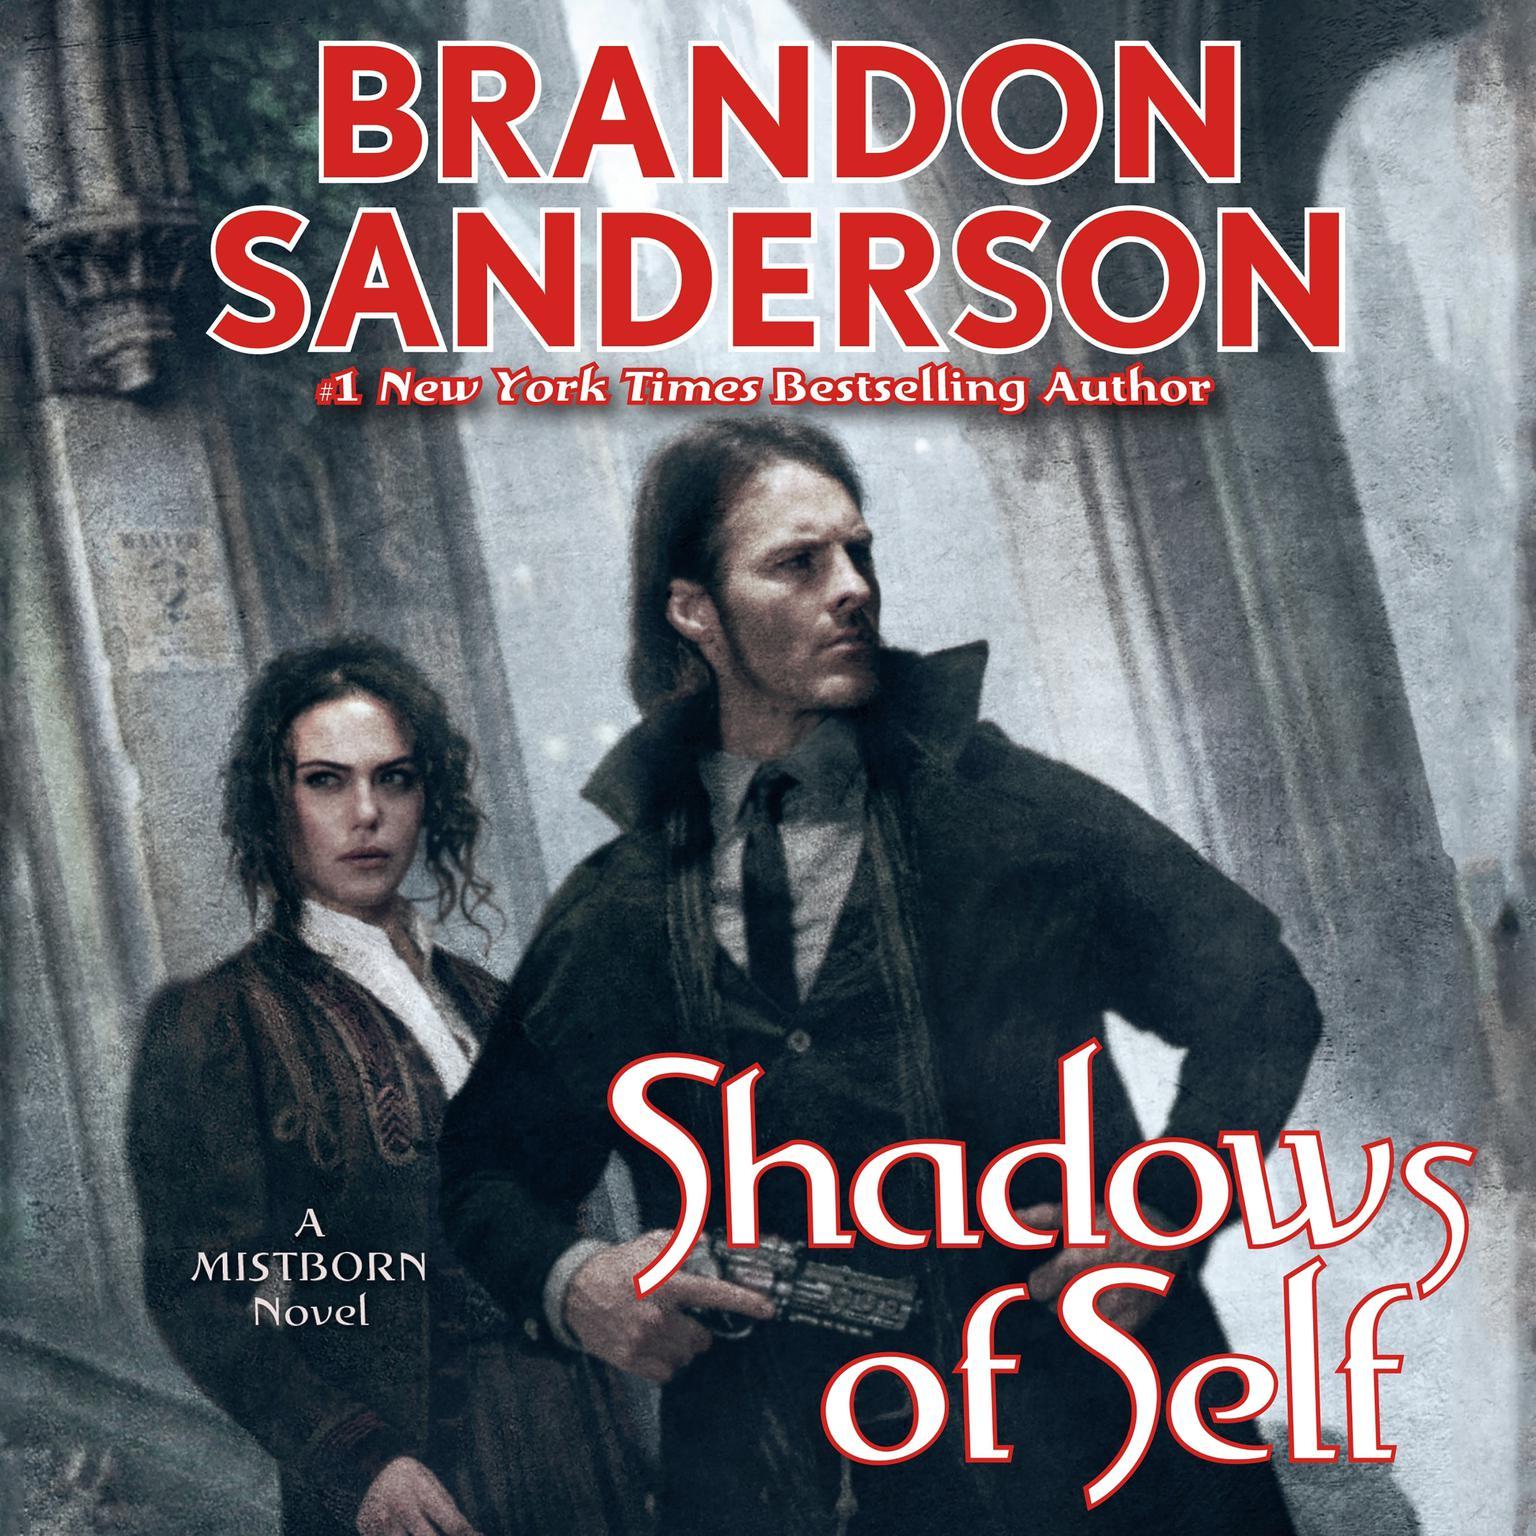 Printable Shadows of Self Audiobook Cover Art